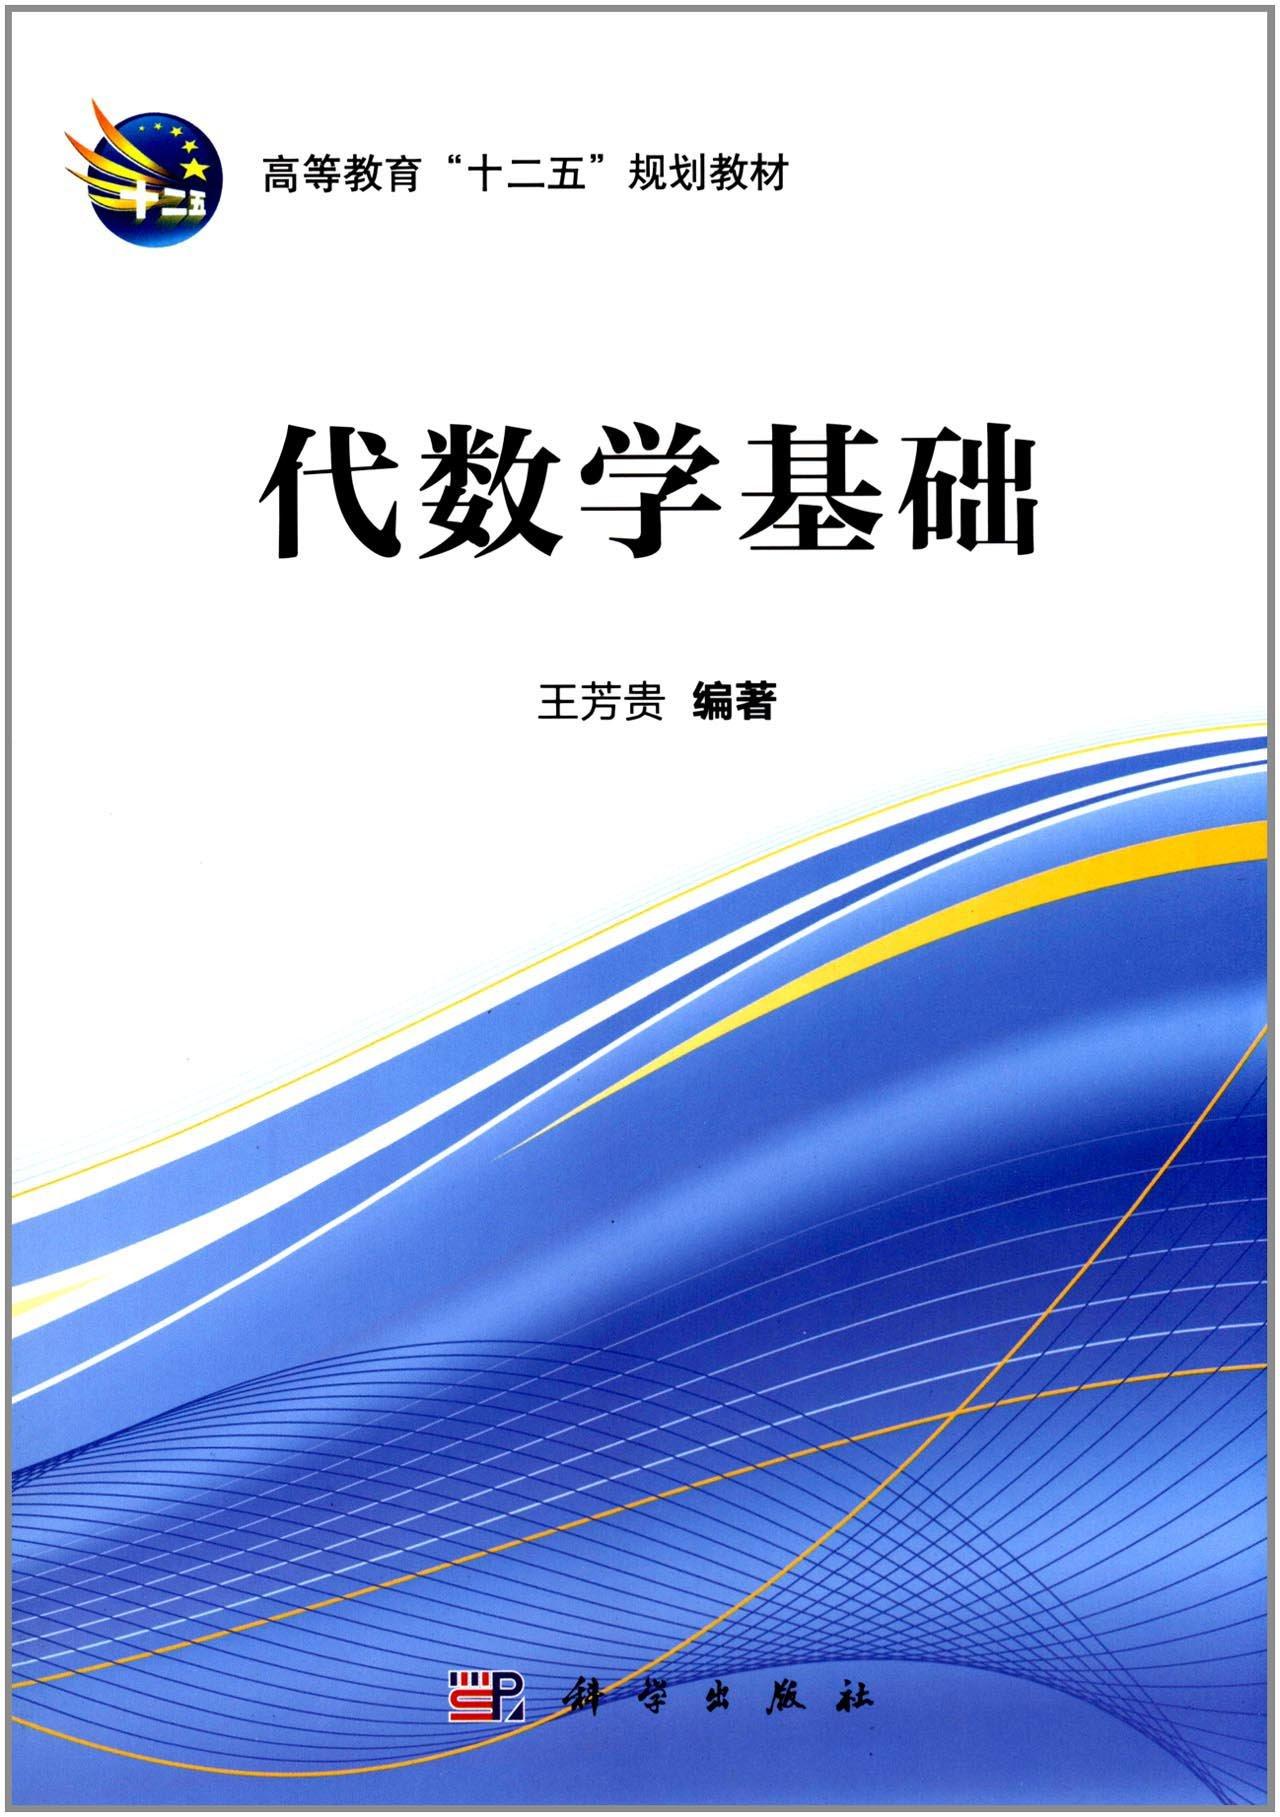 Download Higher Education 12th Five-Year Plan textbooks: algebra basis(Chinese Edition) pdf epub